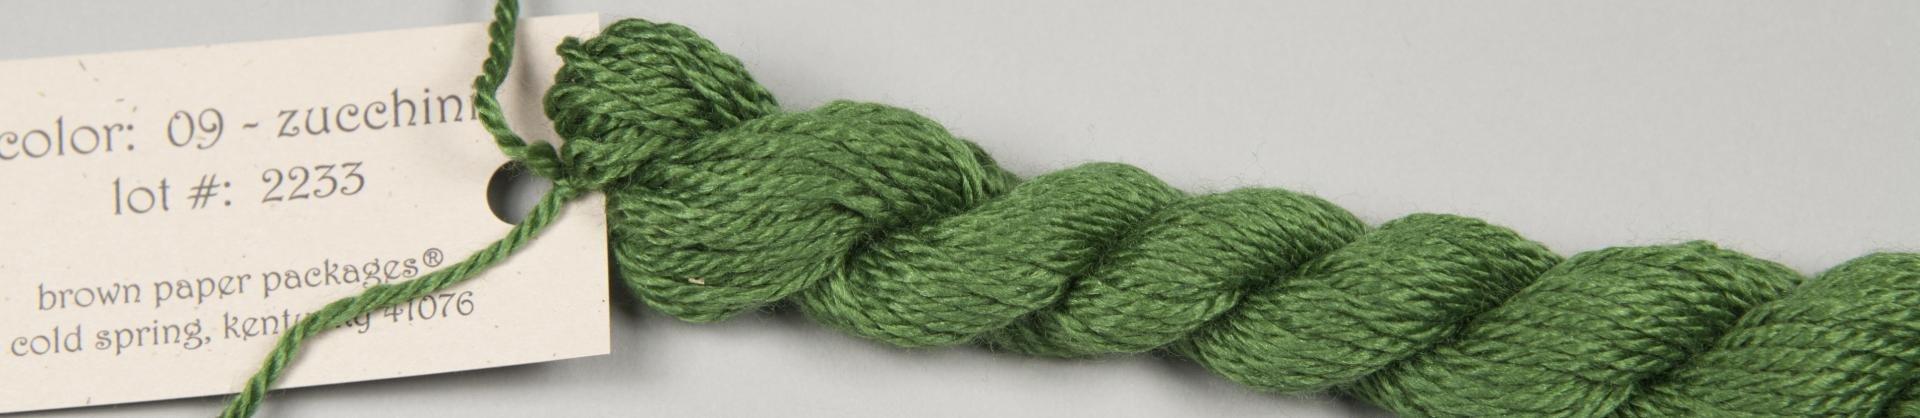 Silk & Ivory 09 Zucchini